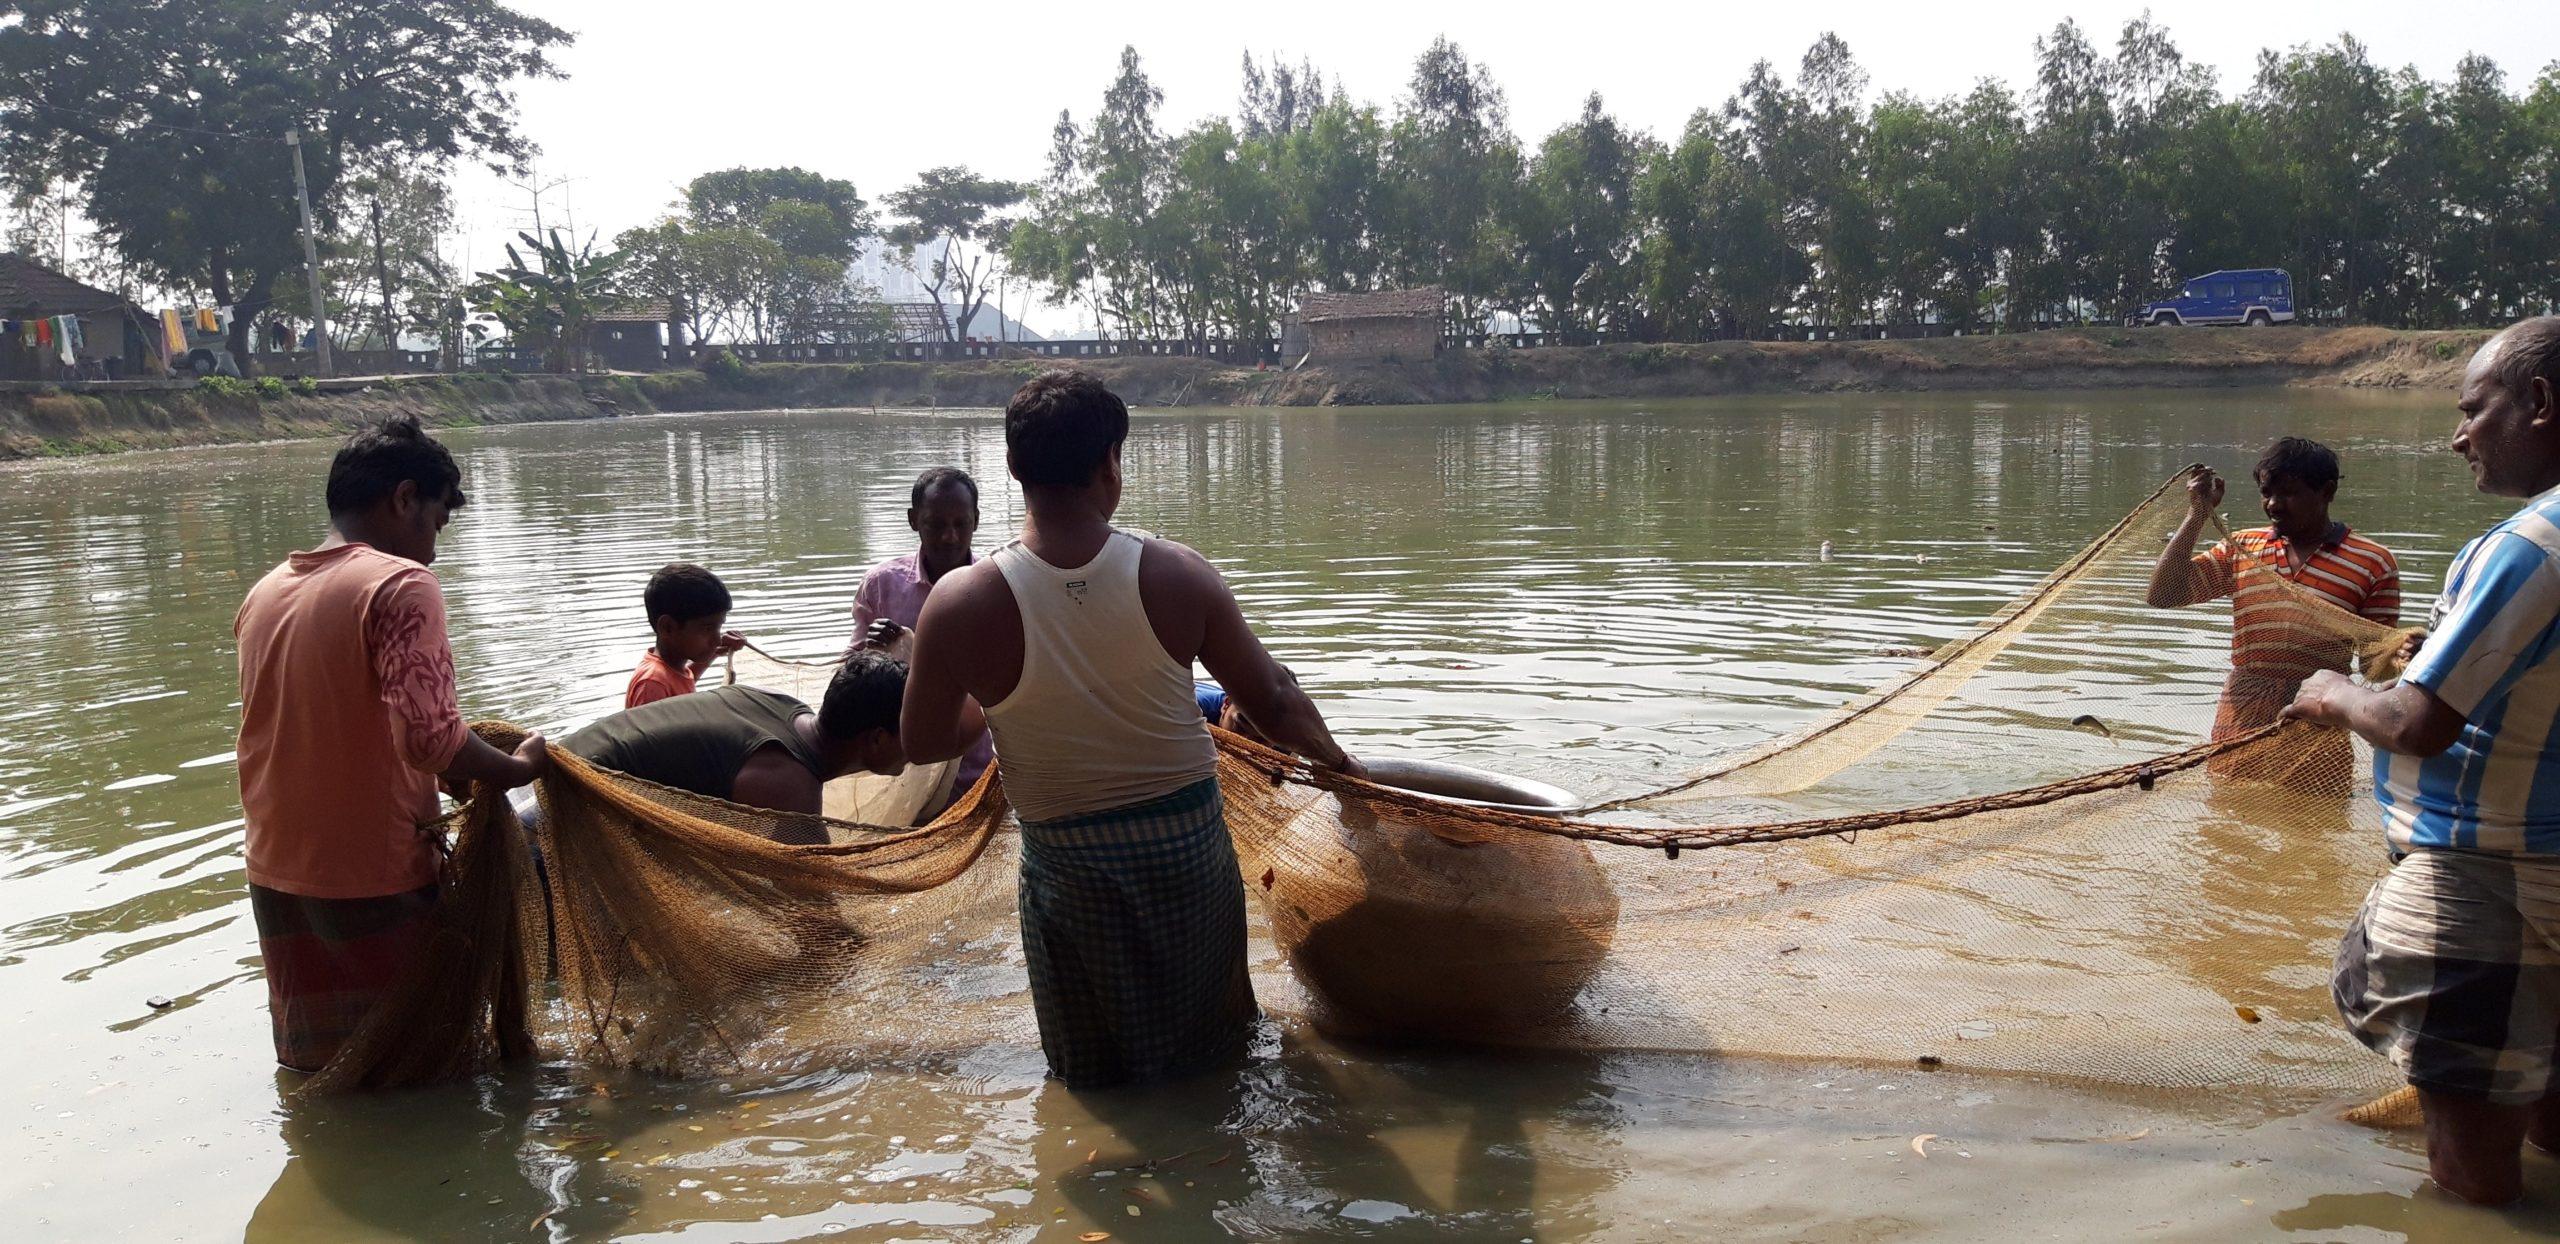 Diversification of Fisheries: Fish farmers in Haldia beat Covid 19 blues